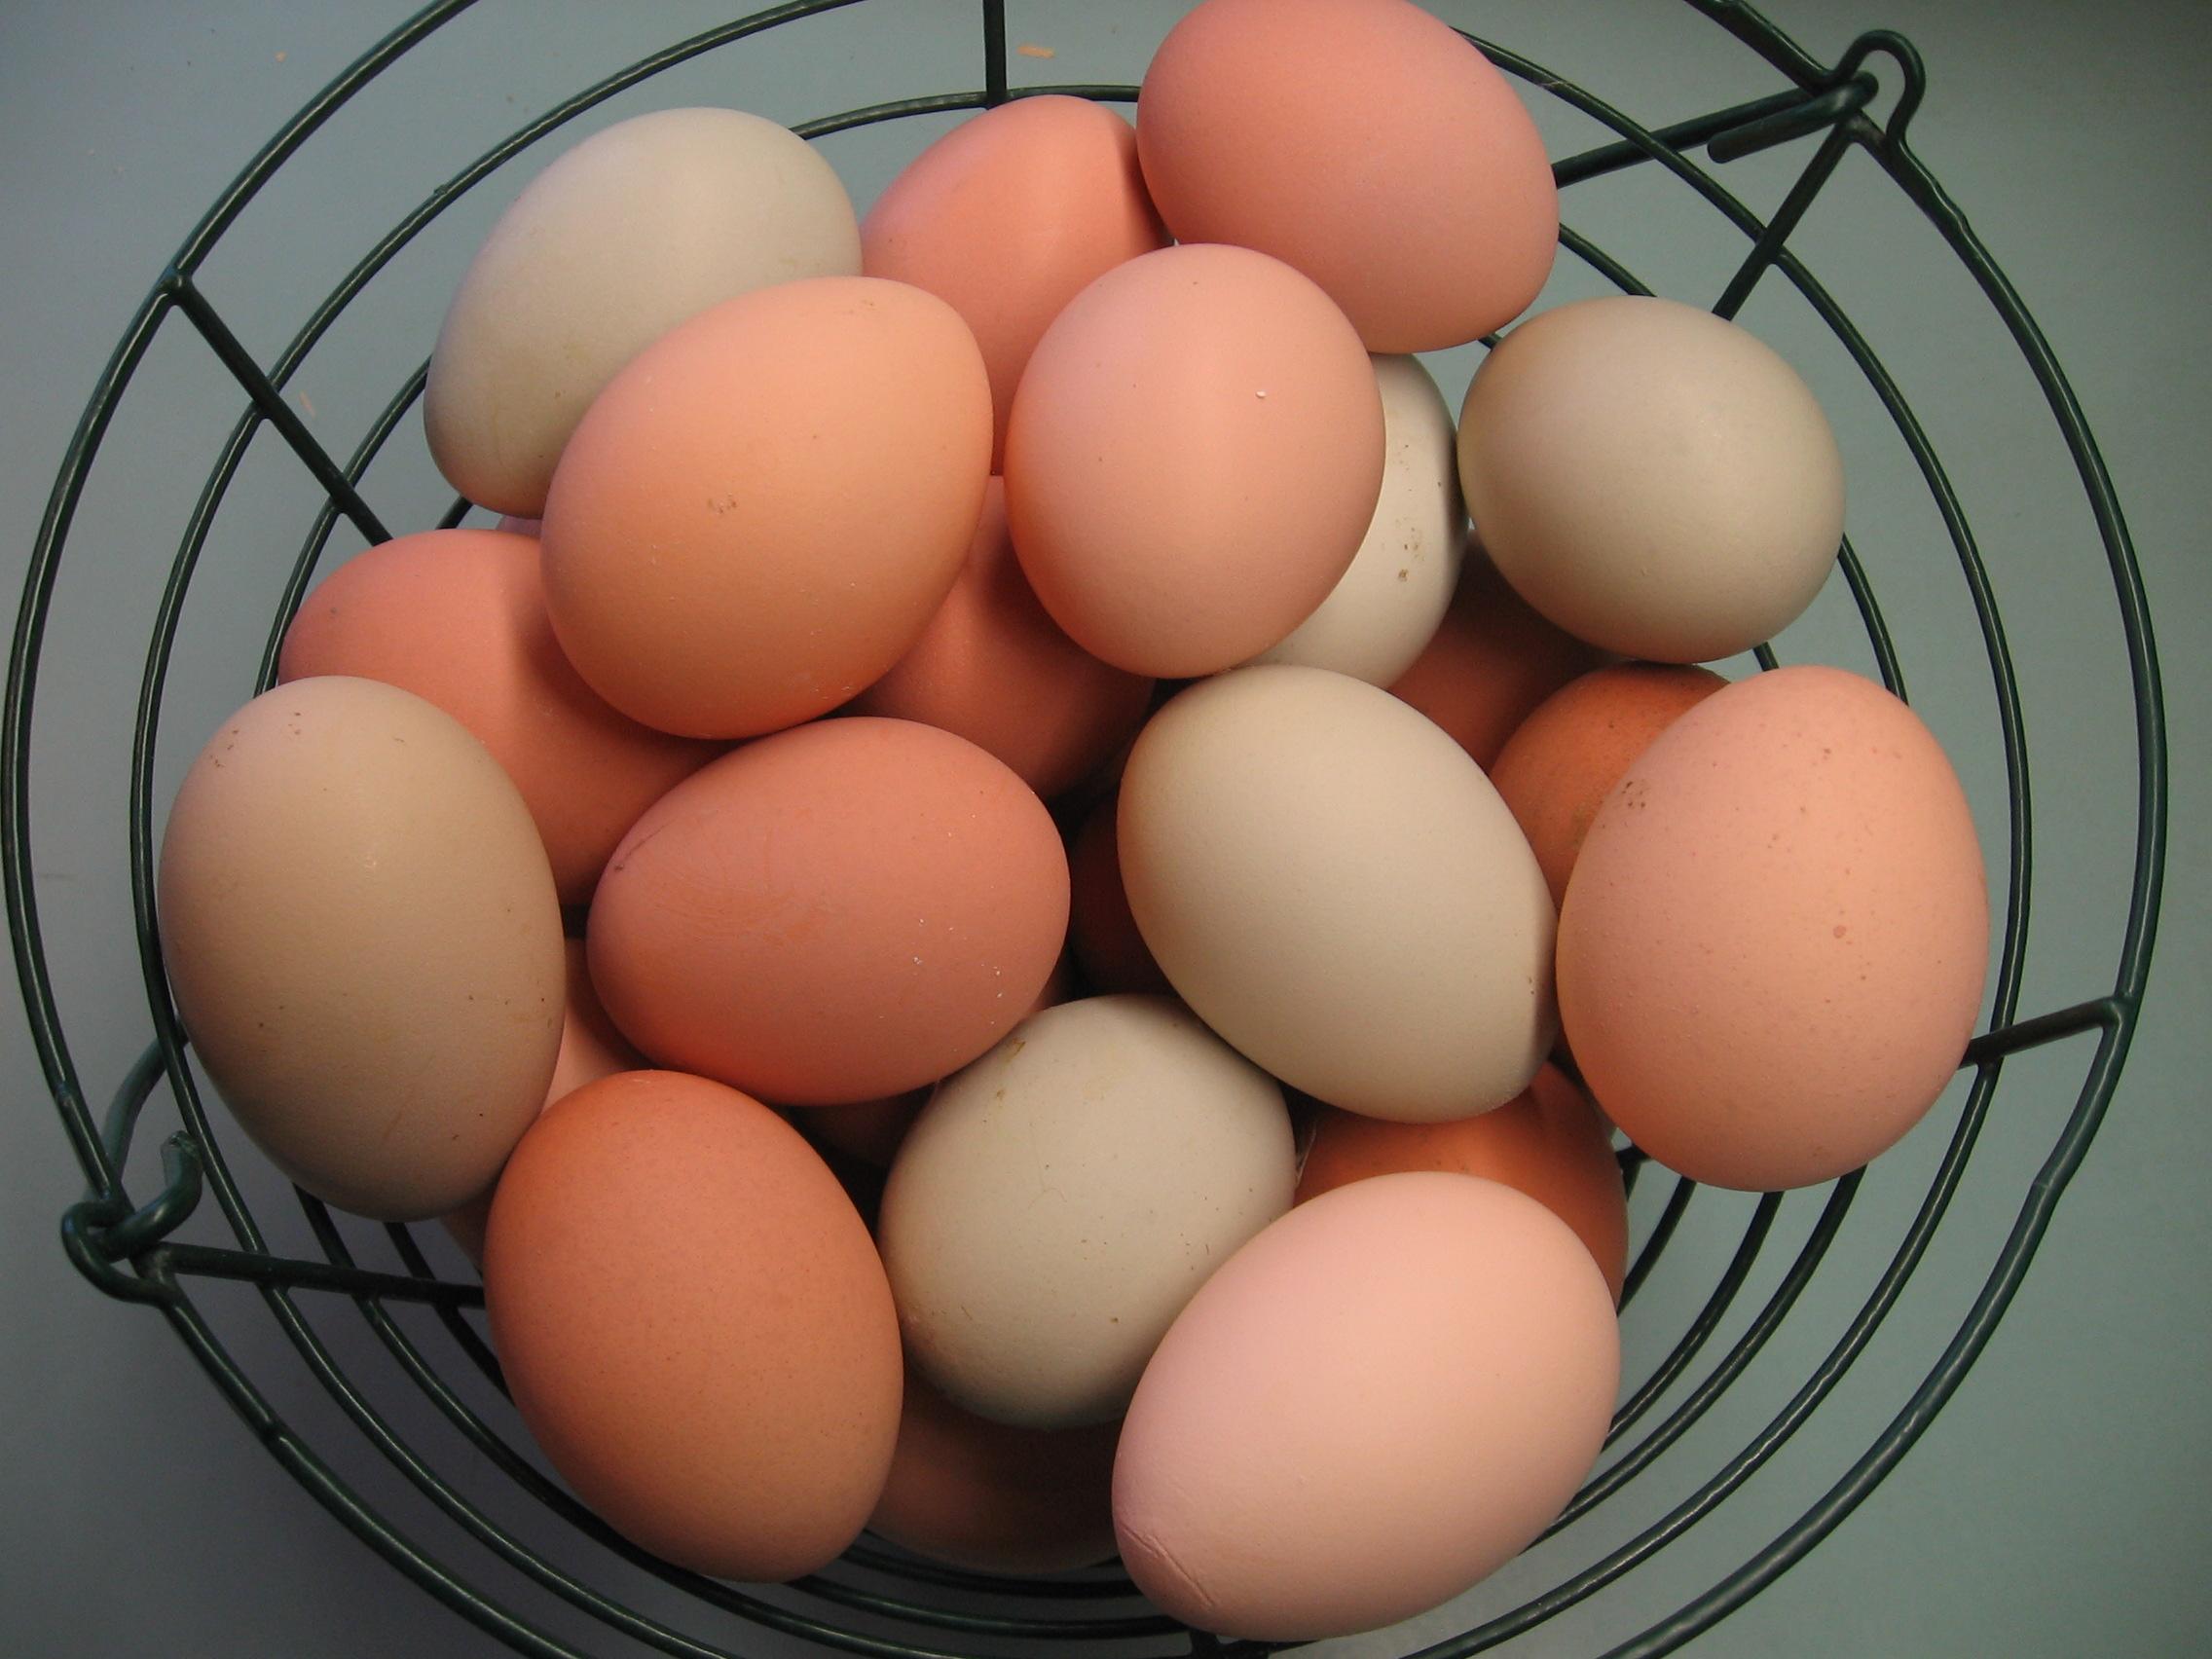 Eggs - 100